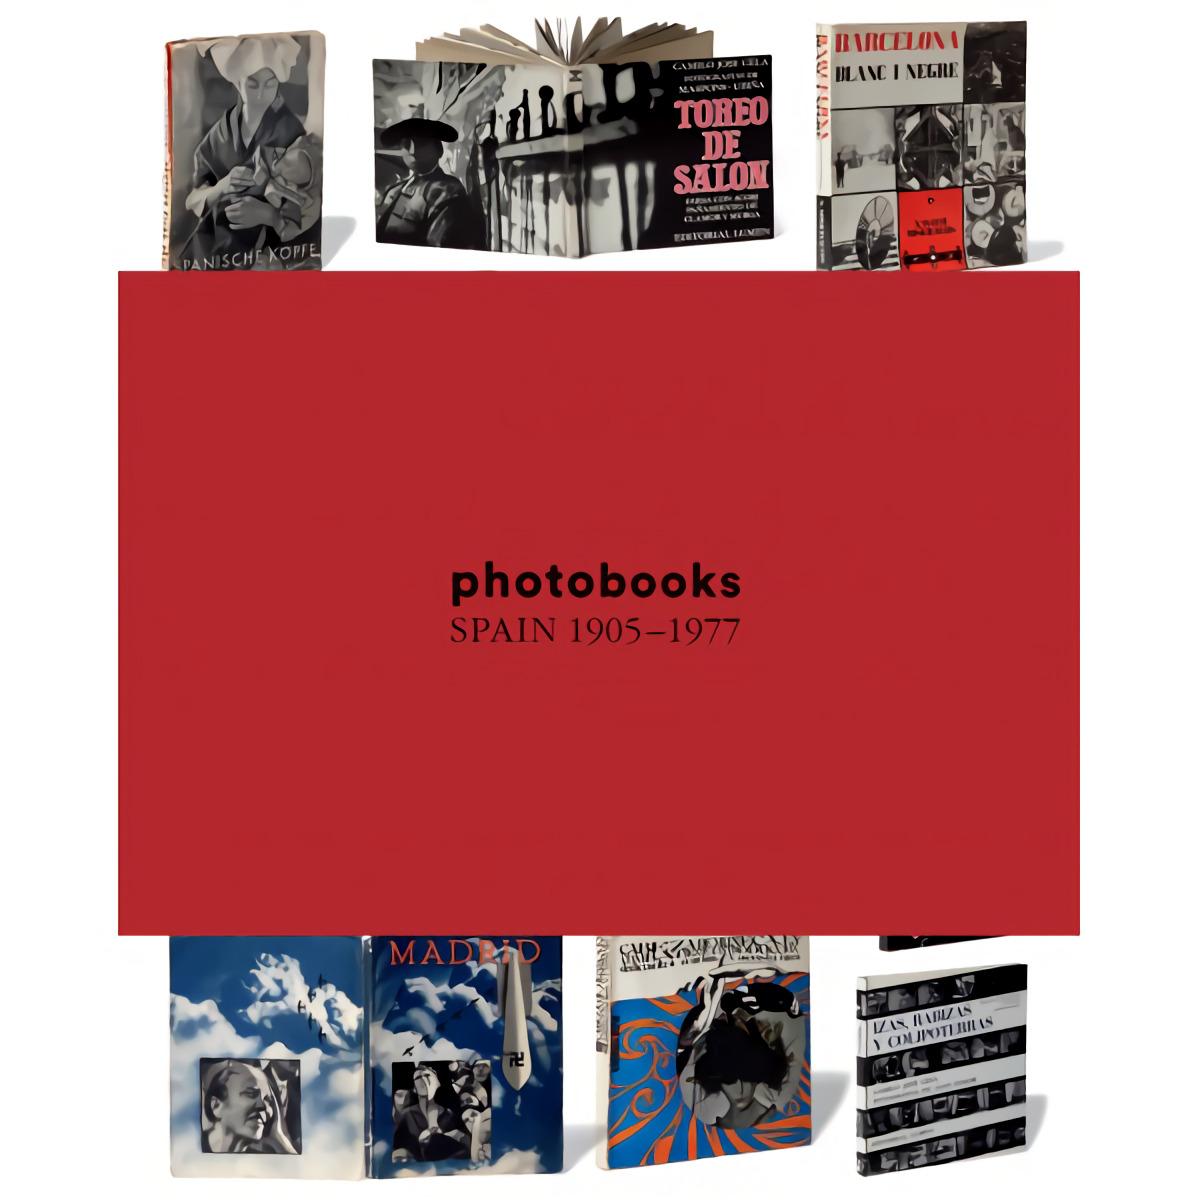 Photobooks 9788415118817